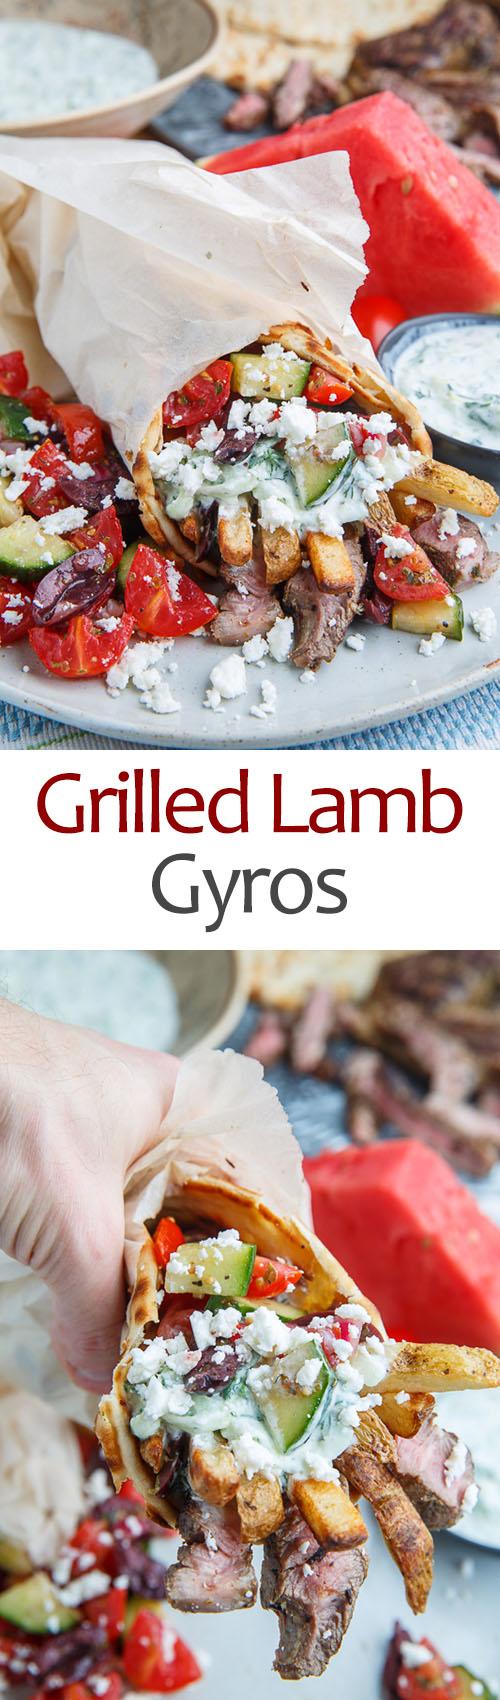 Grilled Lamb Gyros